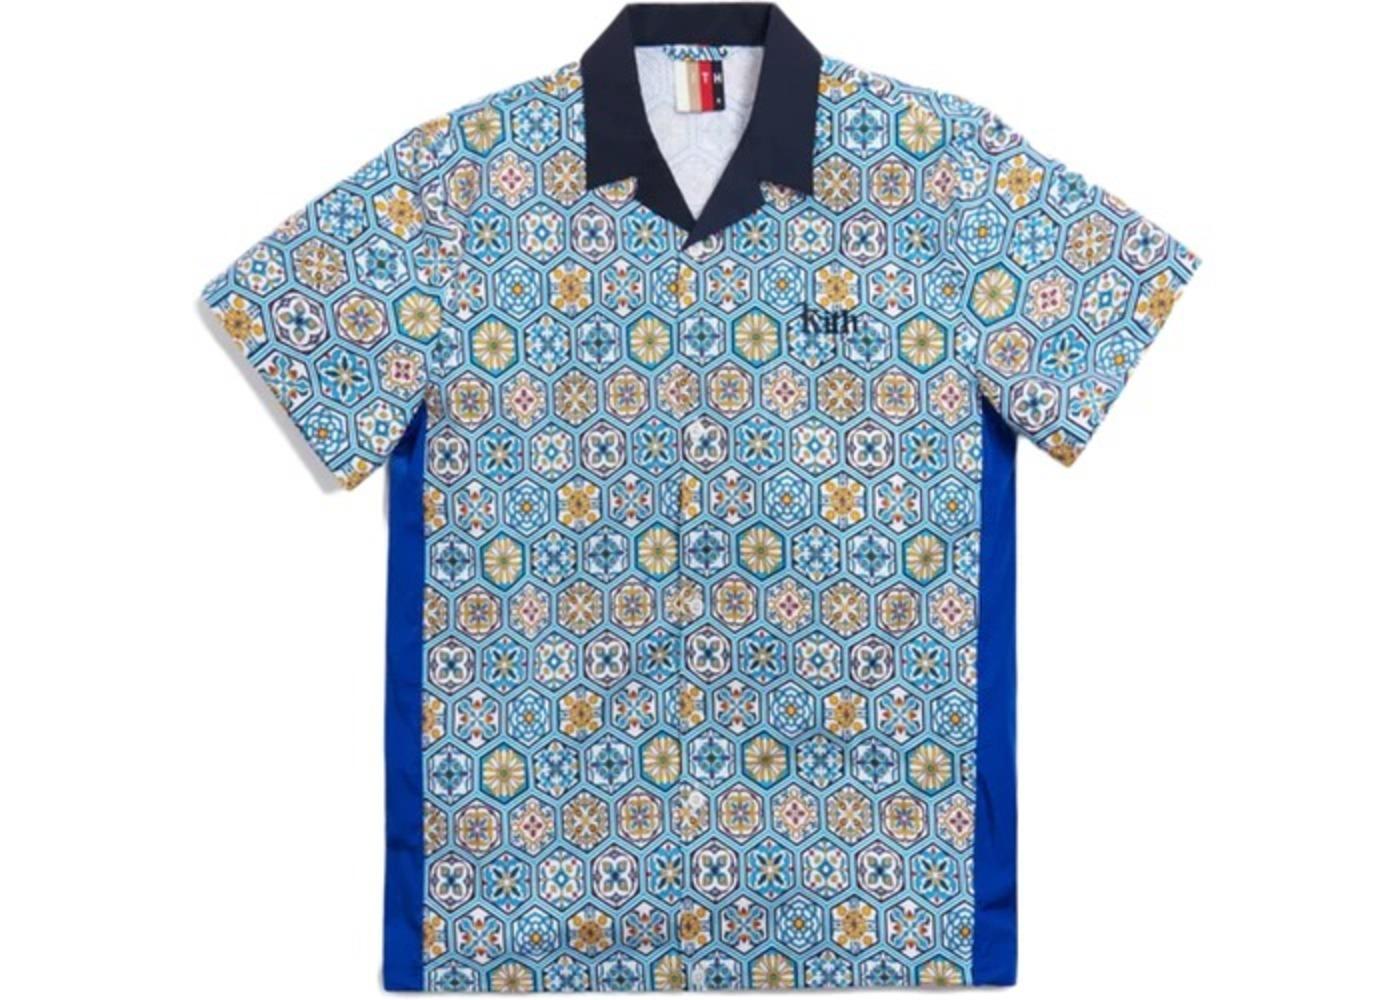 Kith Printed Camp Collar Shirt Blue/Multi の写真